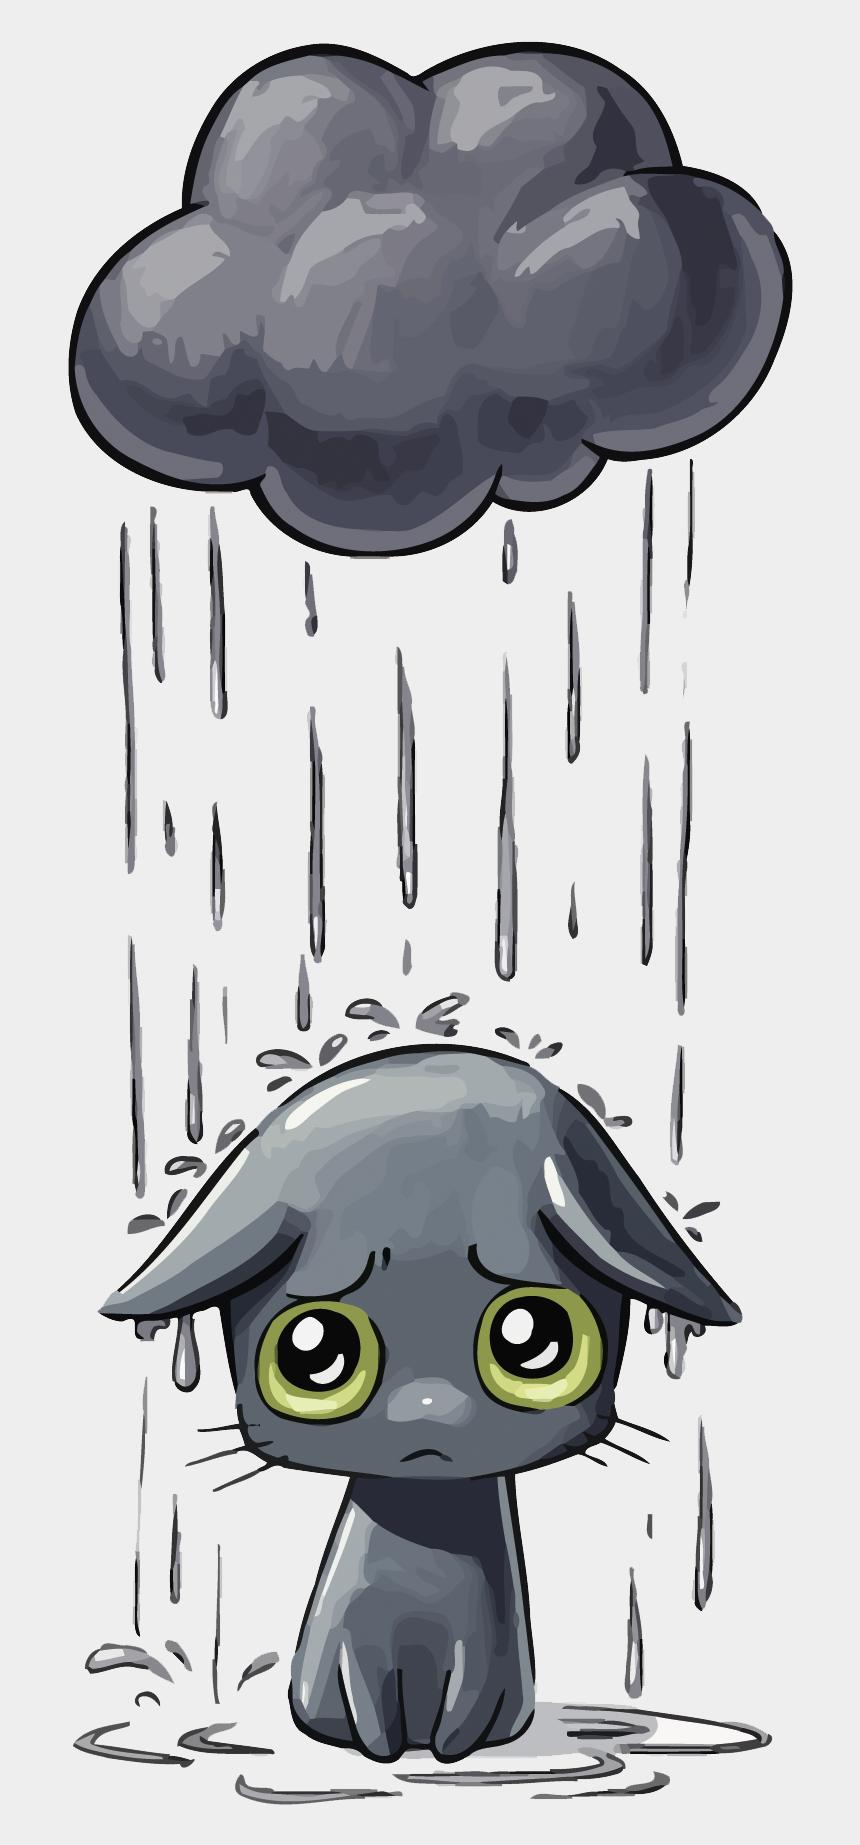 sad clipart, Cartoons - Dog Illustration Cat Vector Kitten Sad Drawing Clipart - Anime Cat In Rain